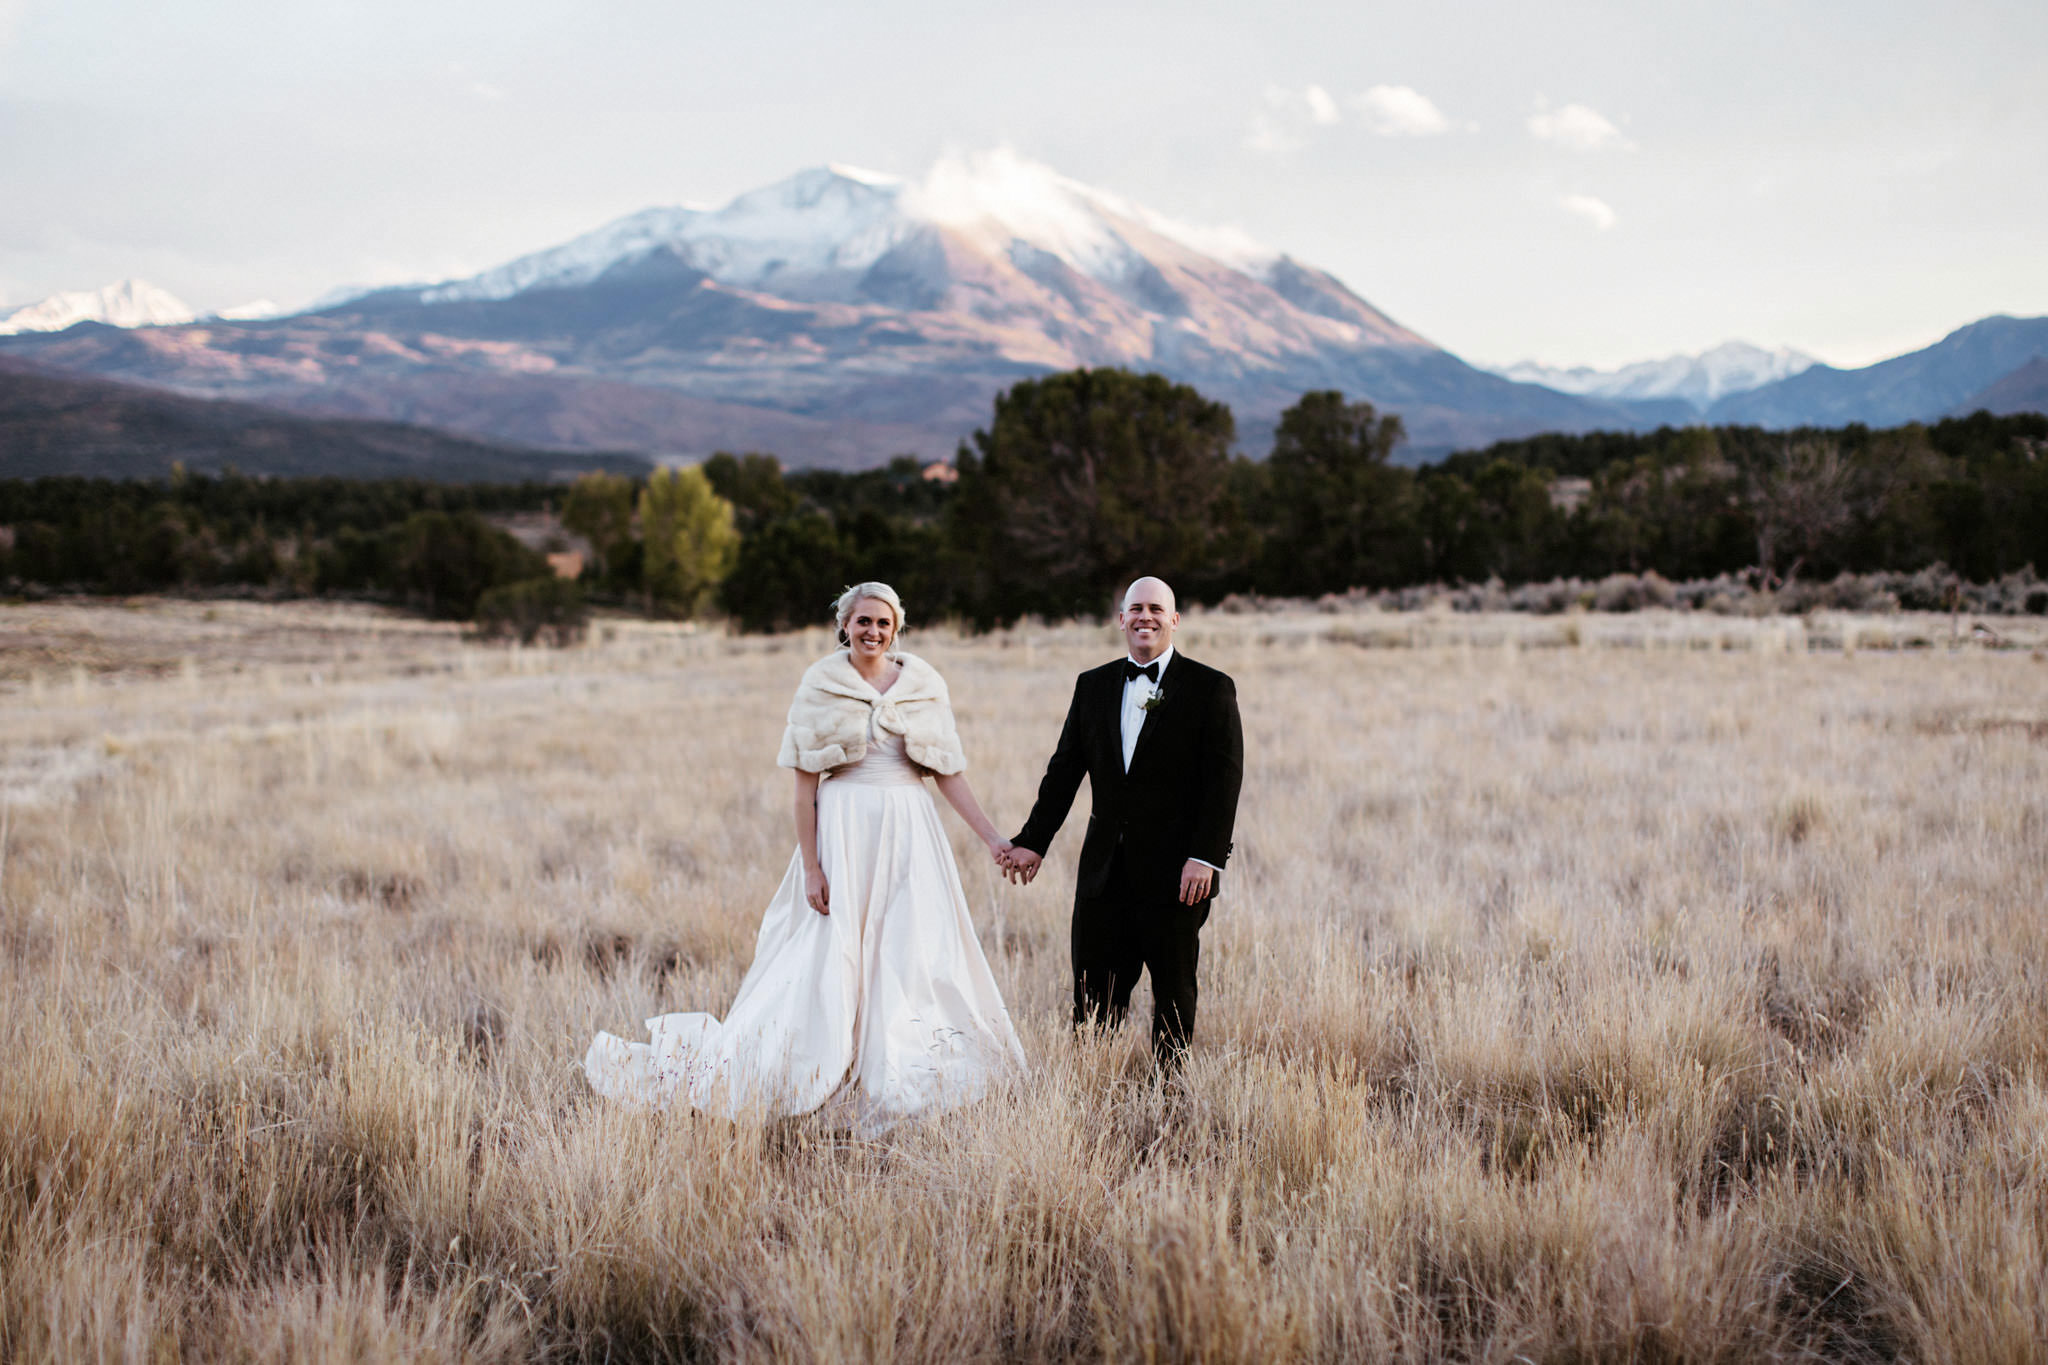 05Aspen Colorado Wedding_Kindling Wedding Photography_06.JPG